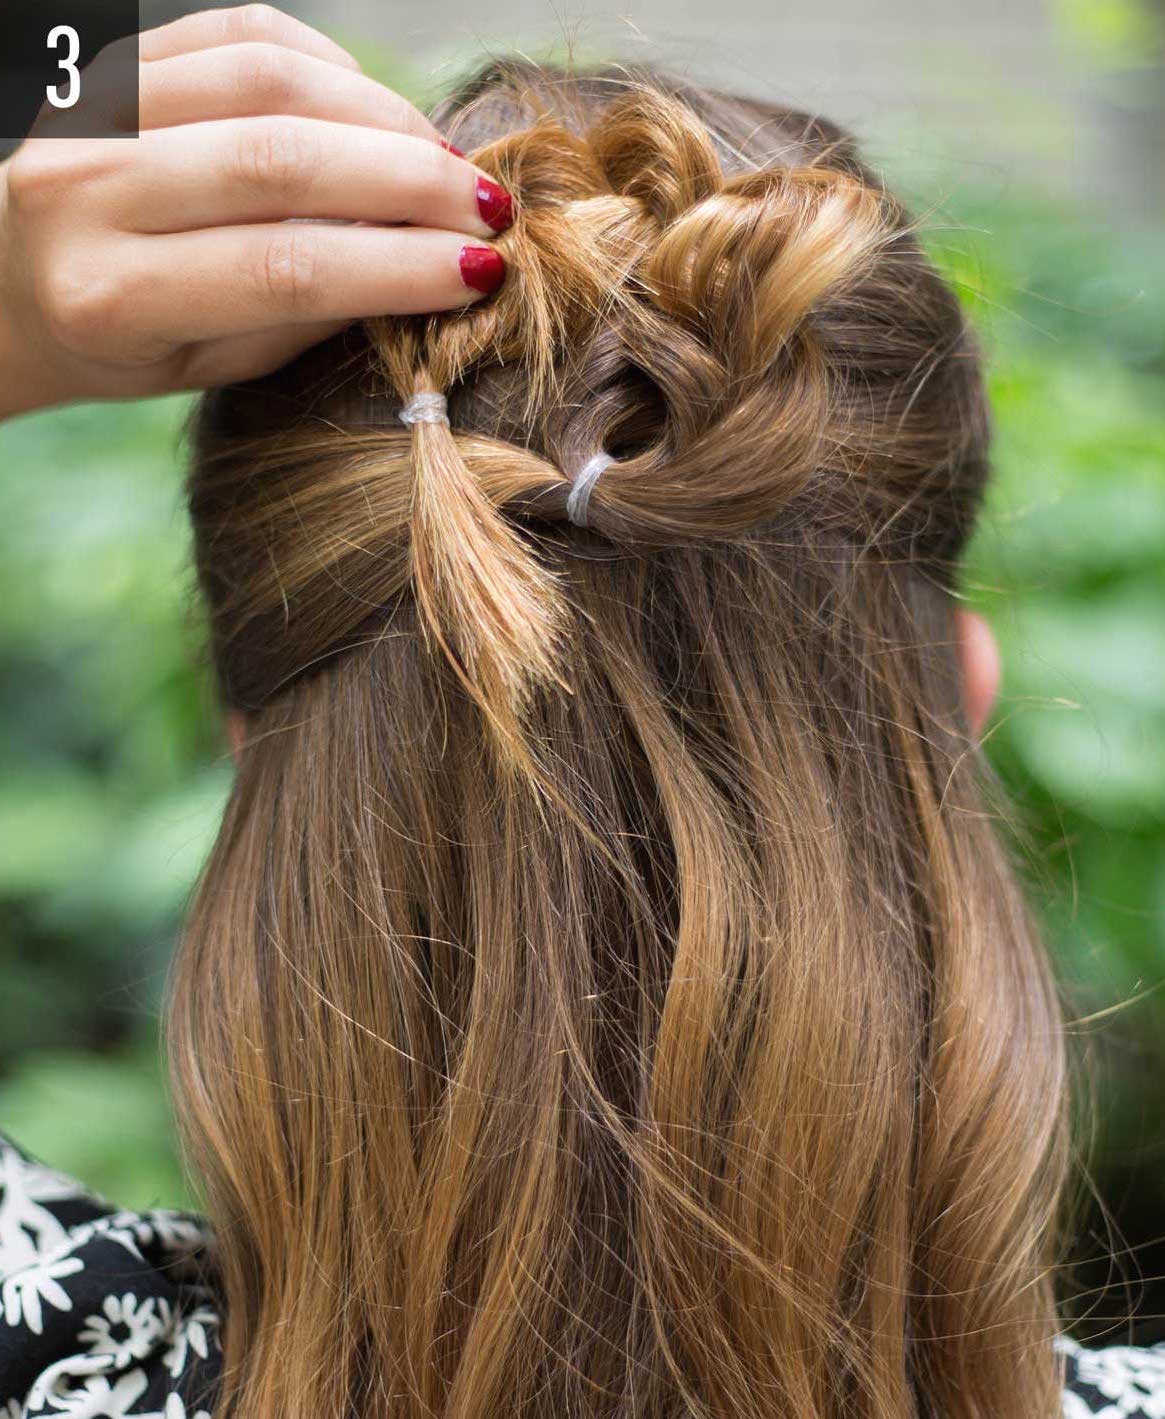 bestie-braid hair 3